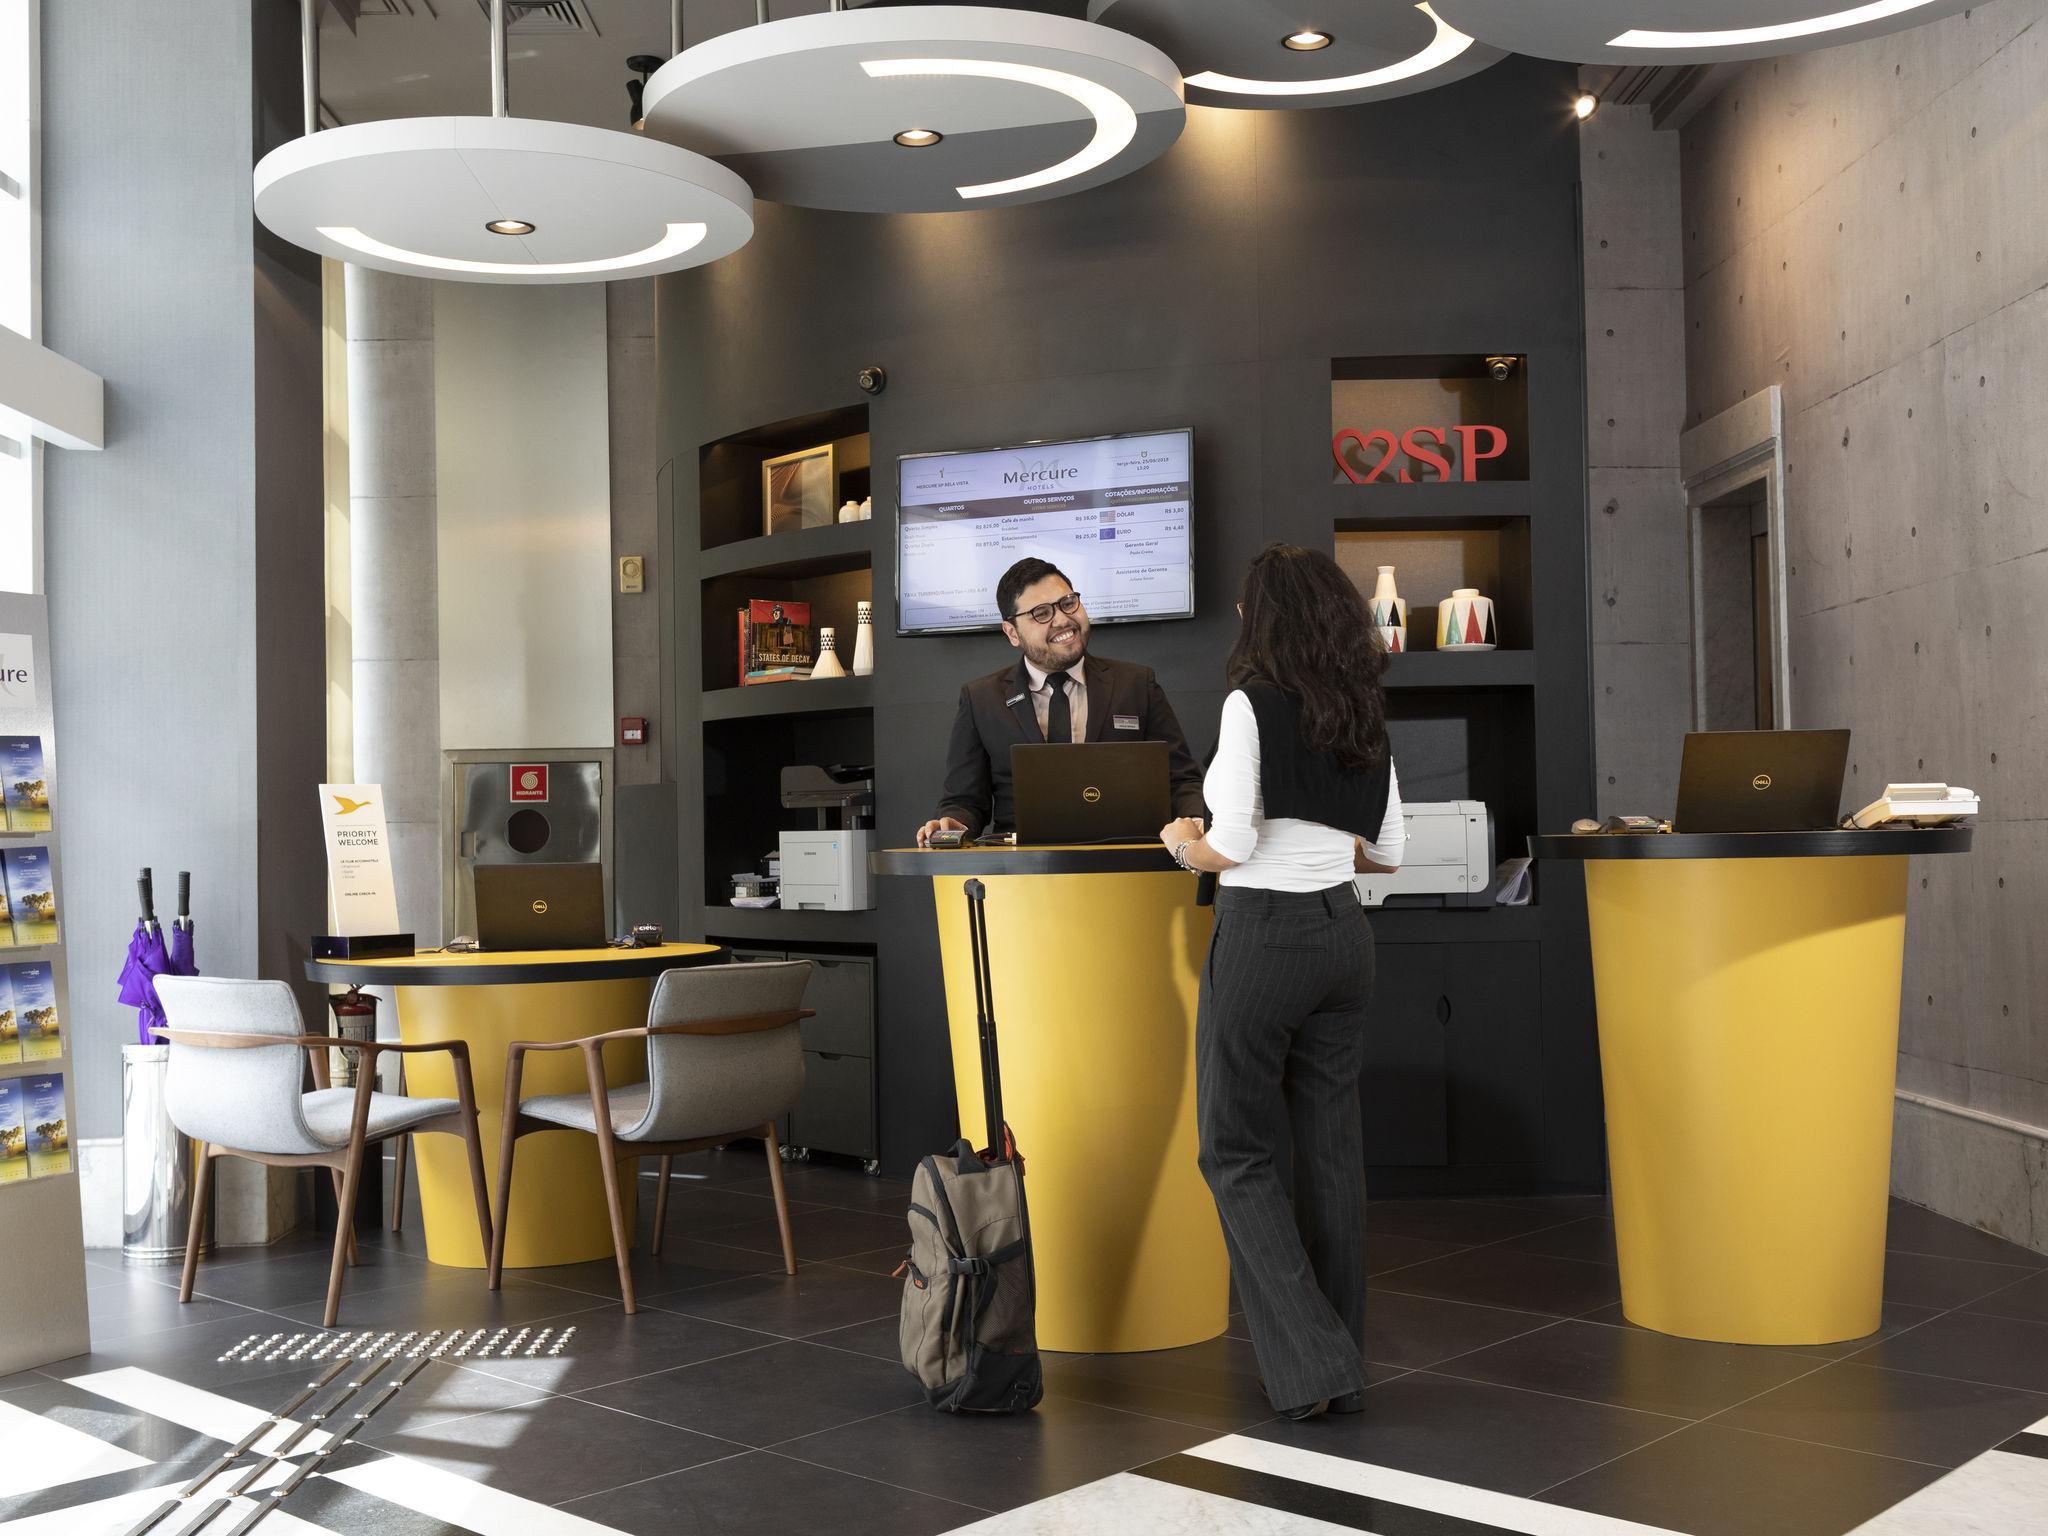 Otel – Mercure São Paulo Bela Vista Hotel